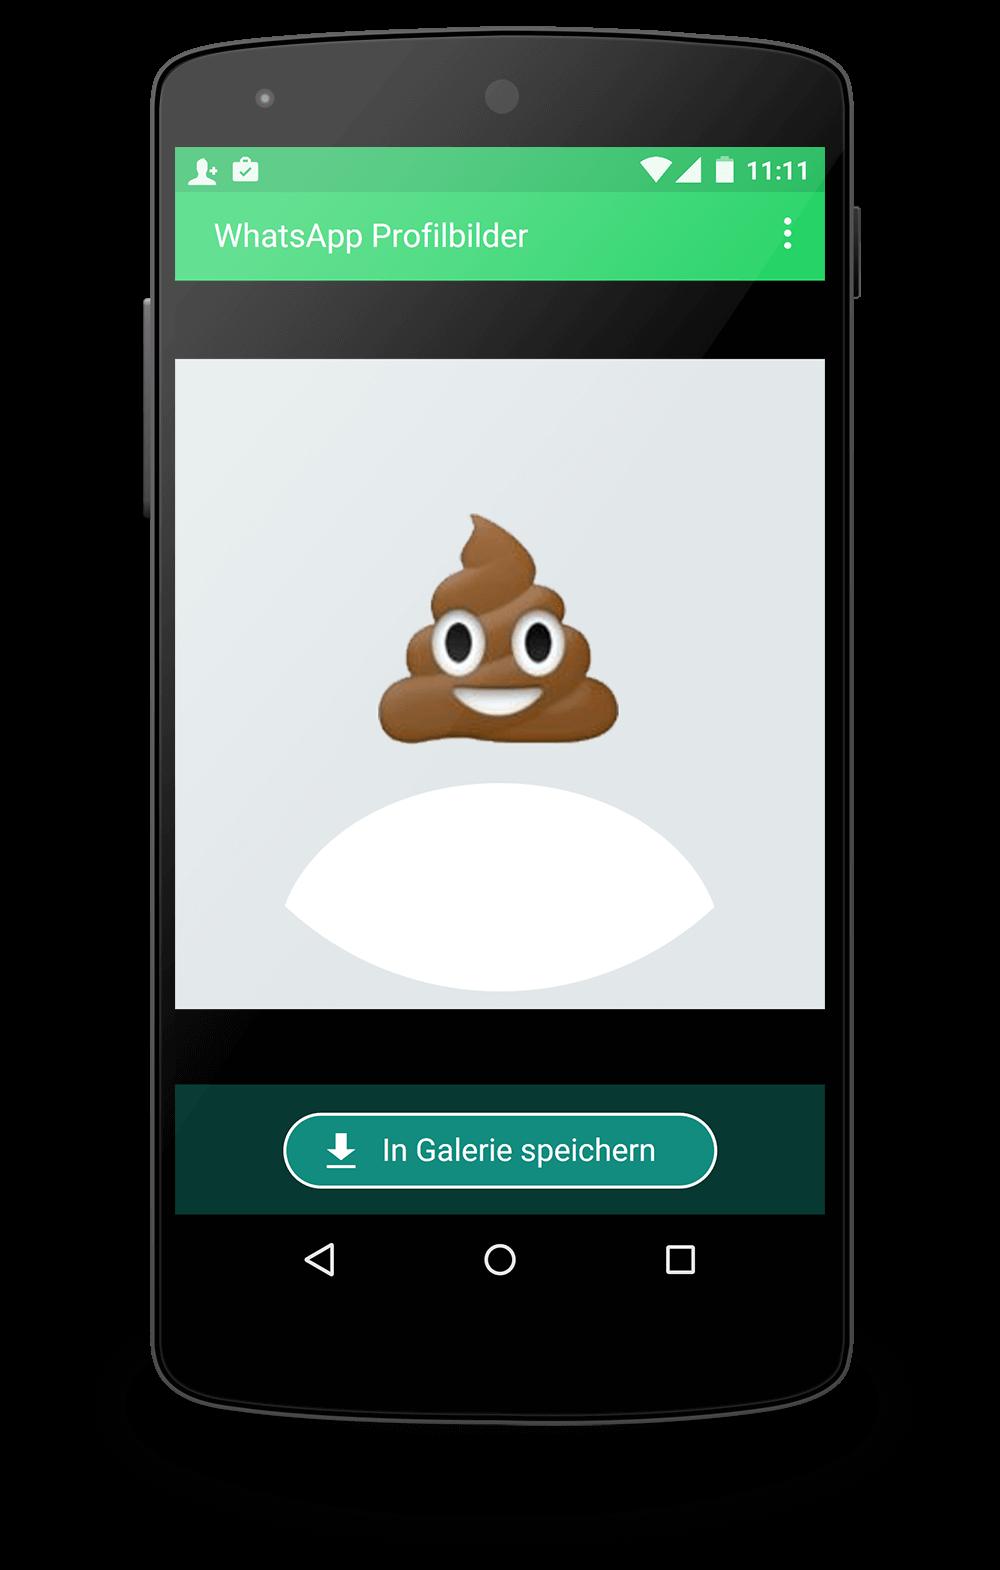 Whatsapp Profilbilder Speichern Whatsapp Status 2019 08 15